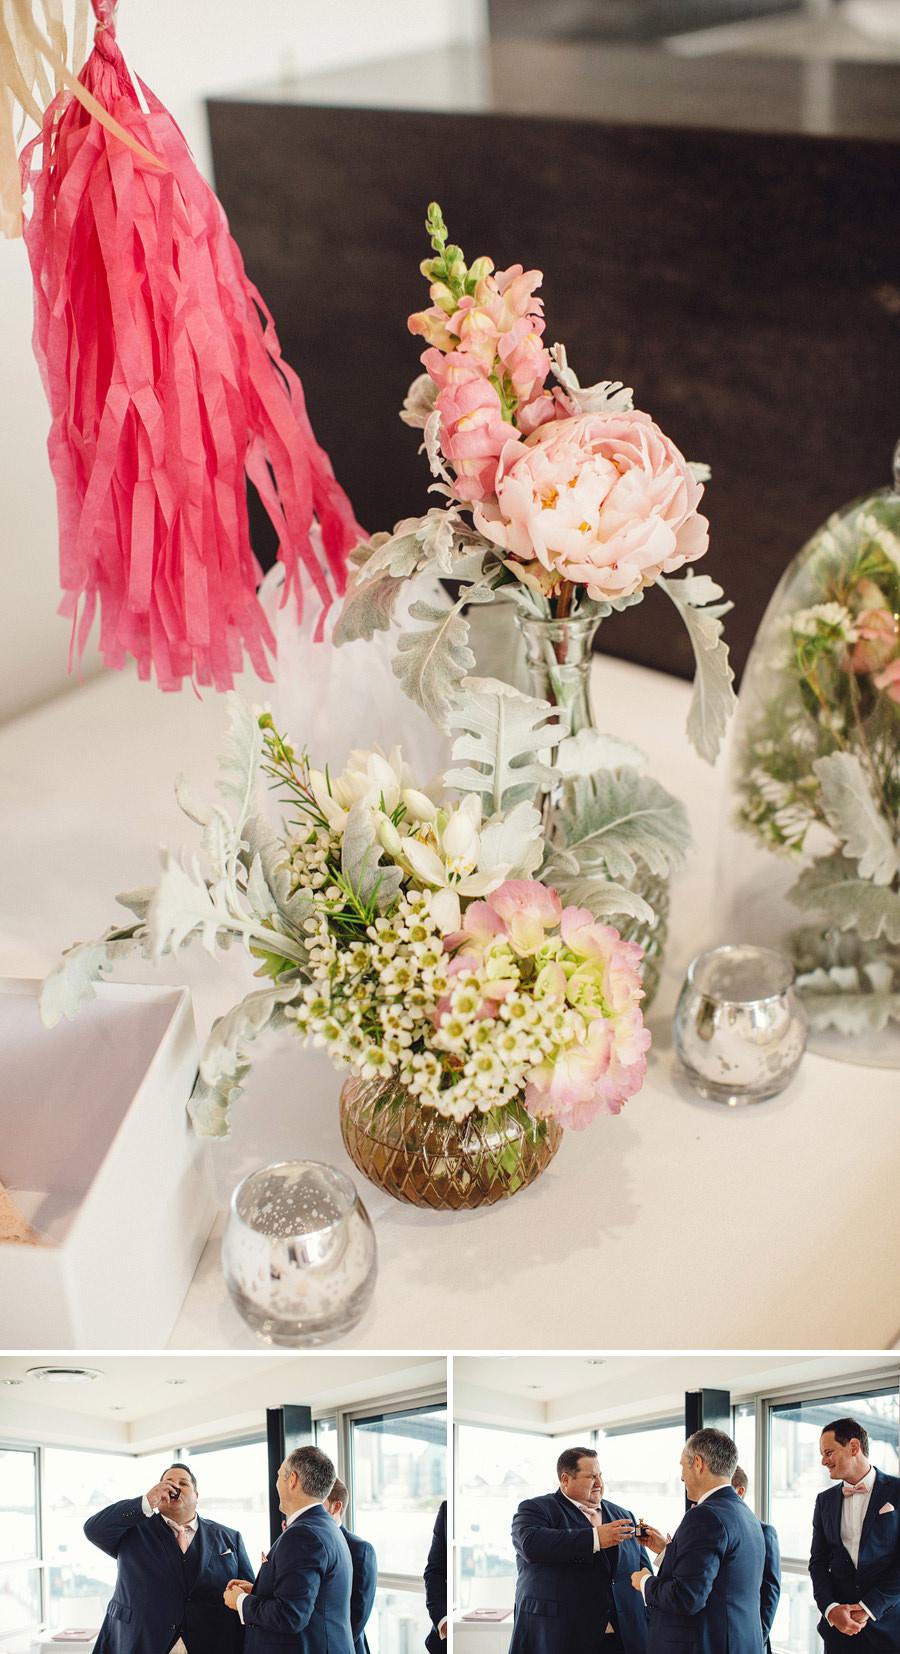 Luna Park Sydney Wedding Photographers: Ceremony details